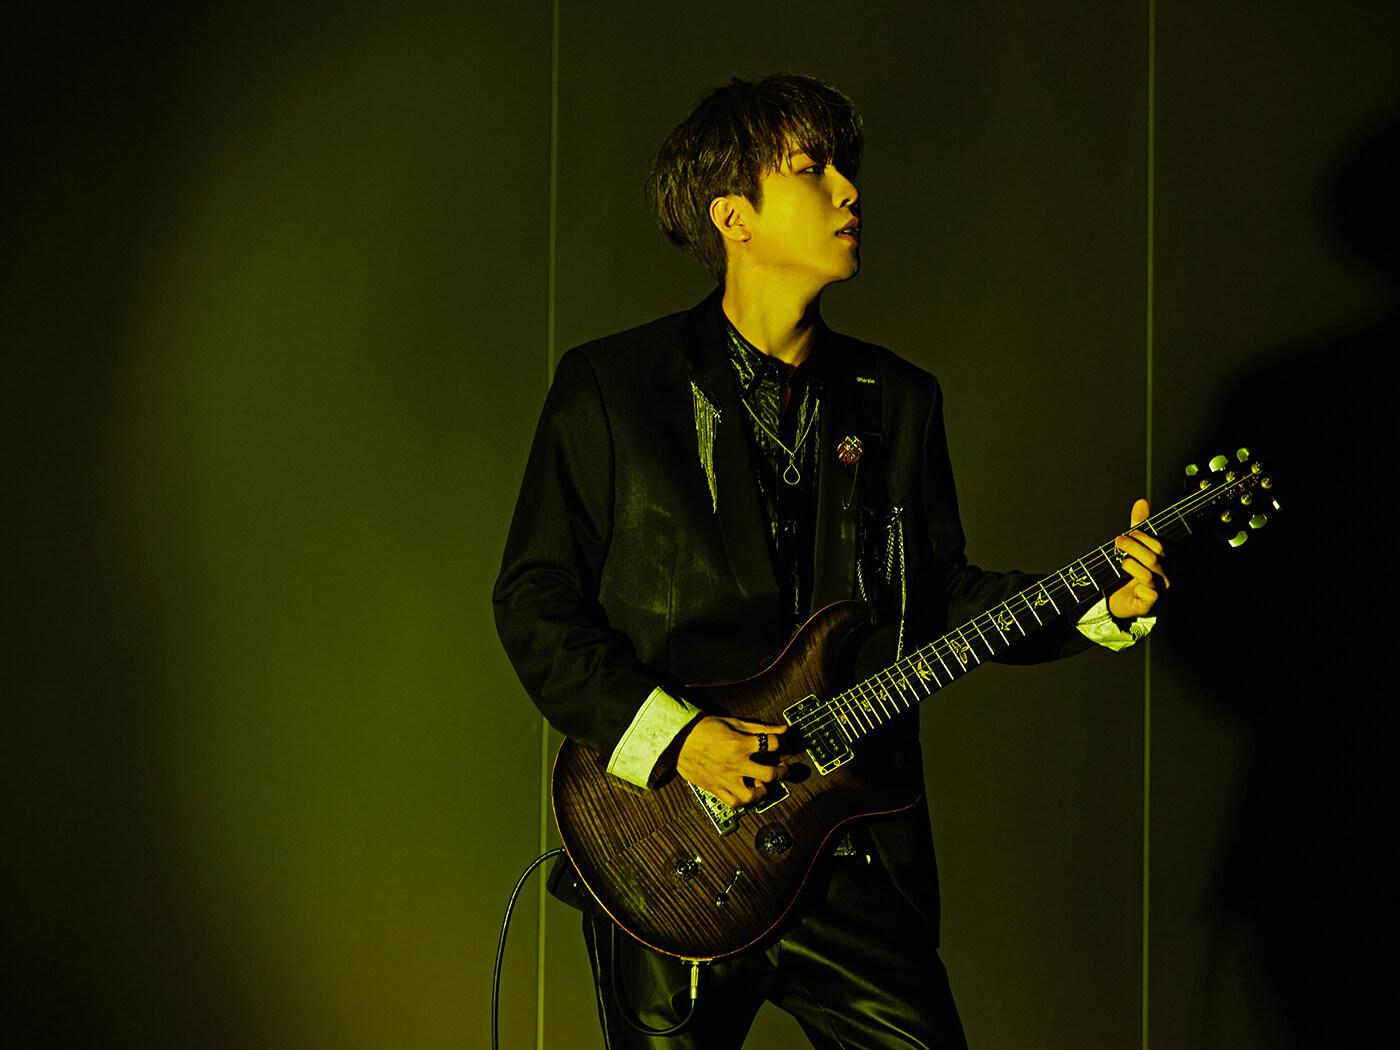 Bursters Junyong Ahn